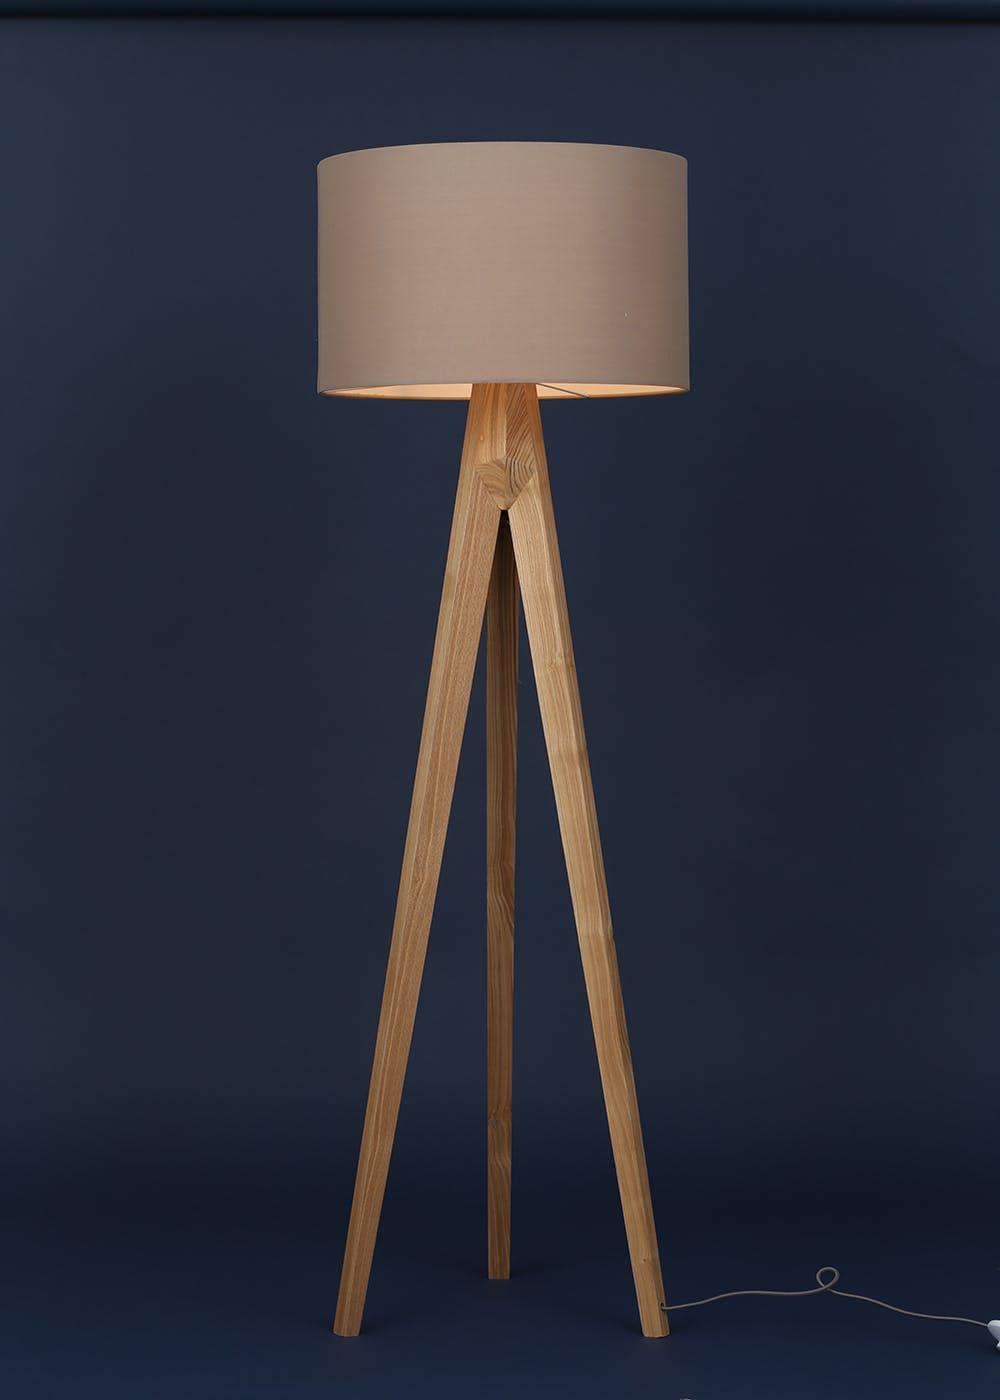 Tarvos Tripod Floor Lamp H127cm X W45cm Brown Wooden